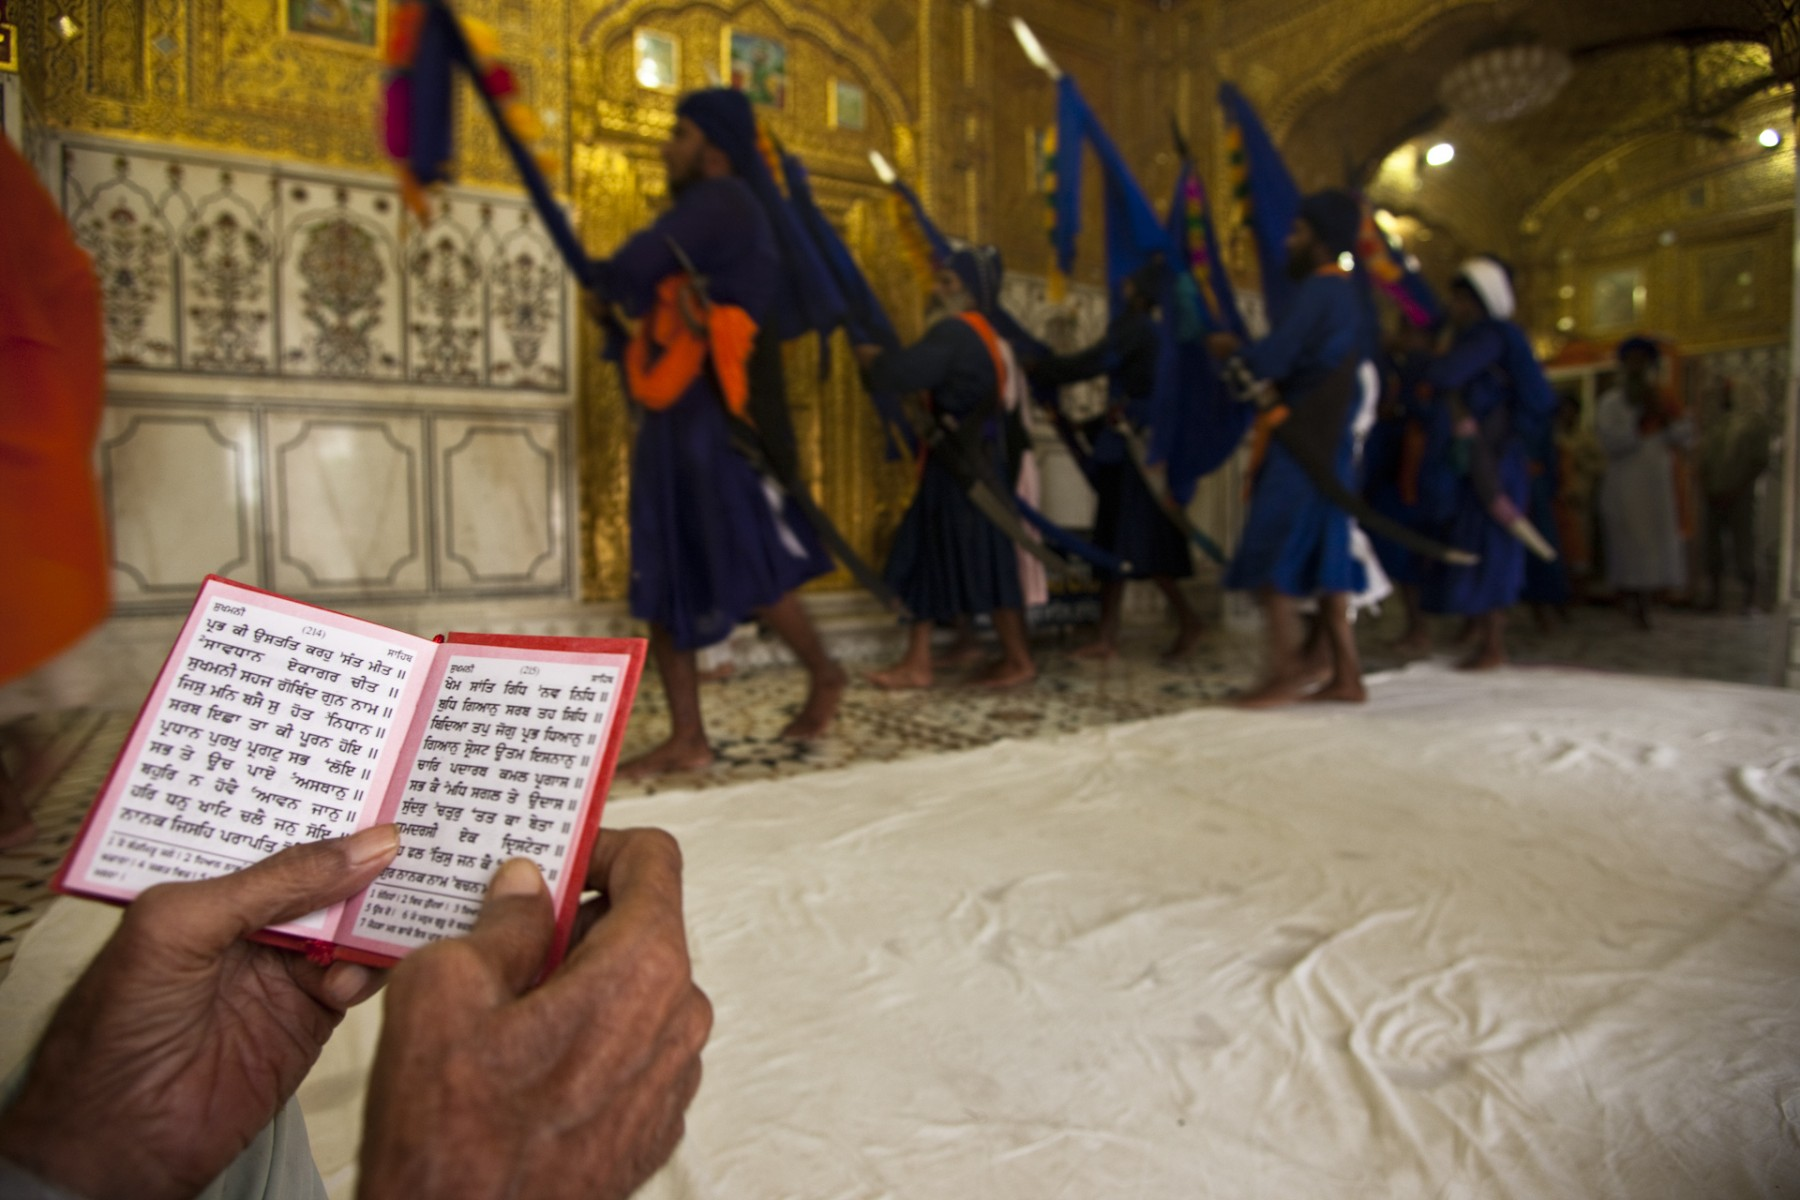 Hazoor Sahib